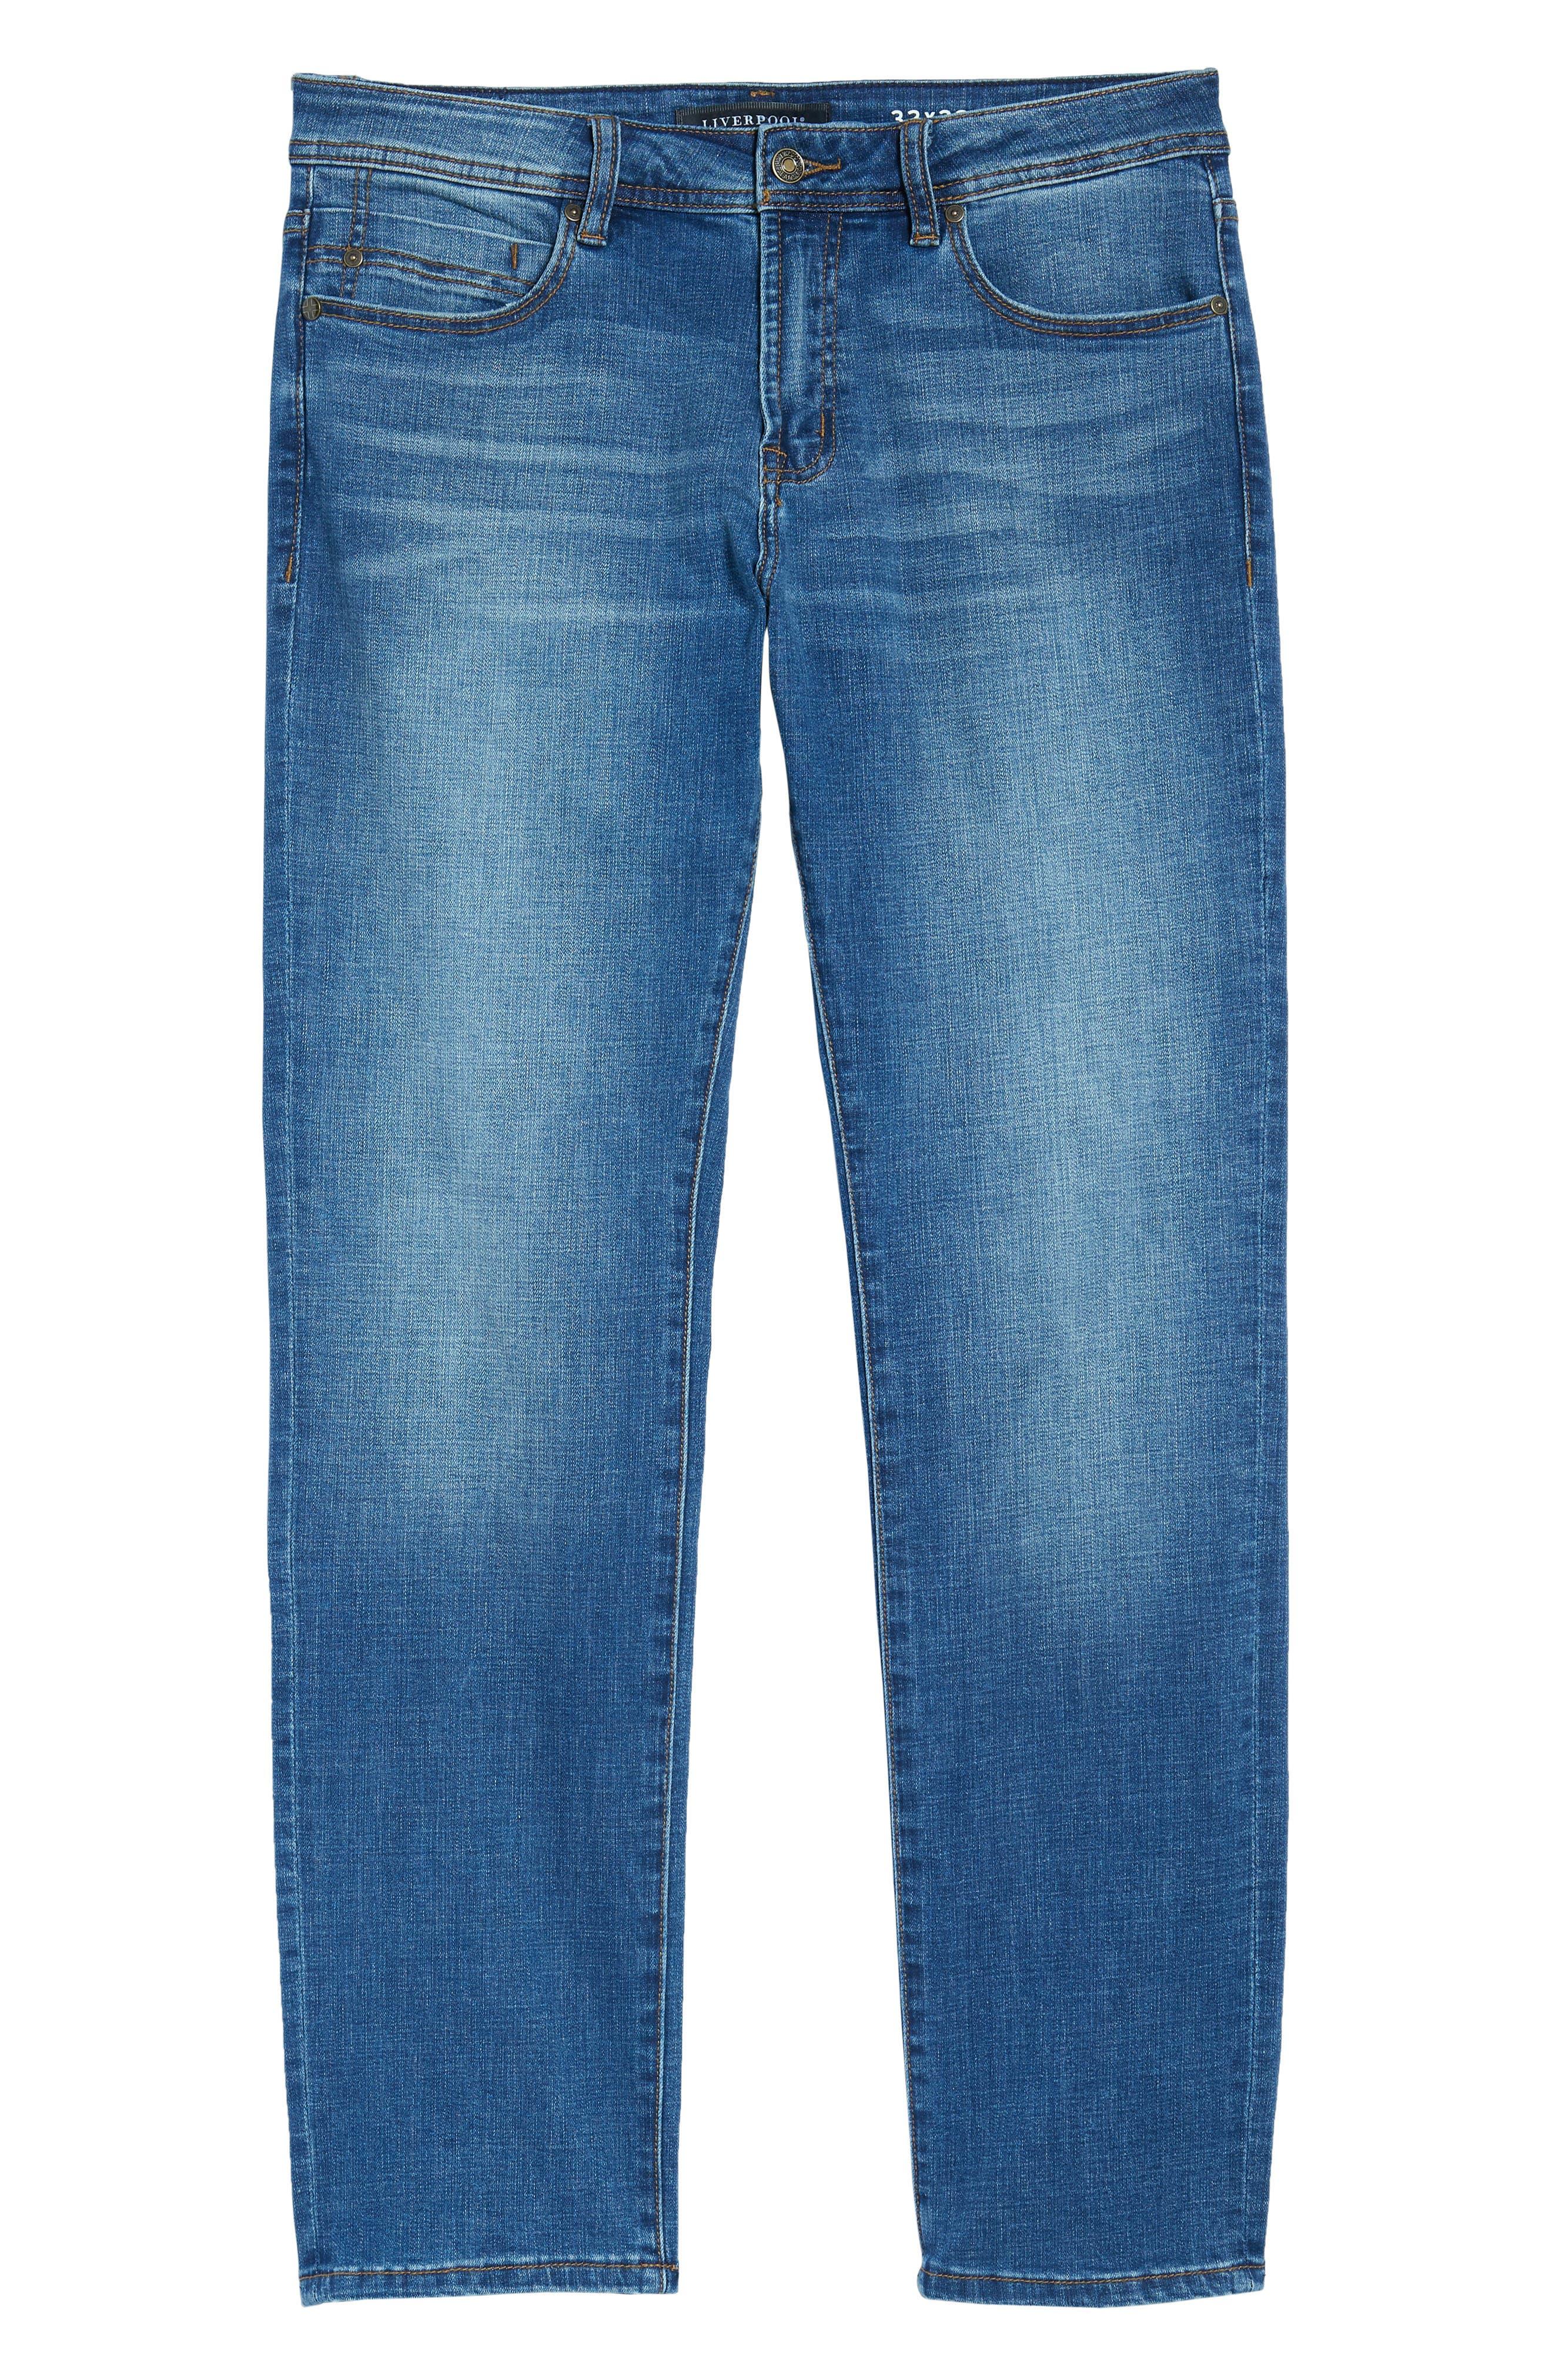 Jeans Co. Regent Relaxed Straight Leg Jeans,                             Alternate thumbnail 6, color,